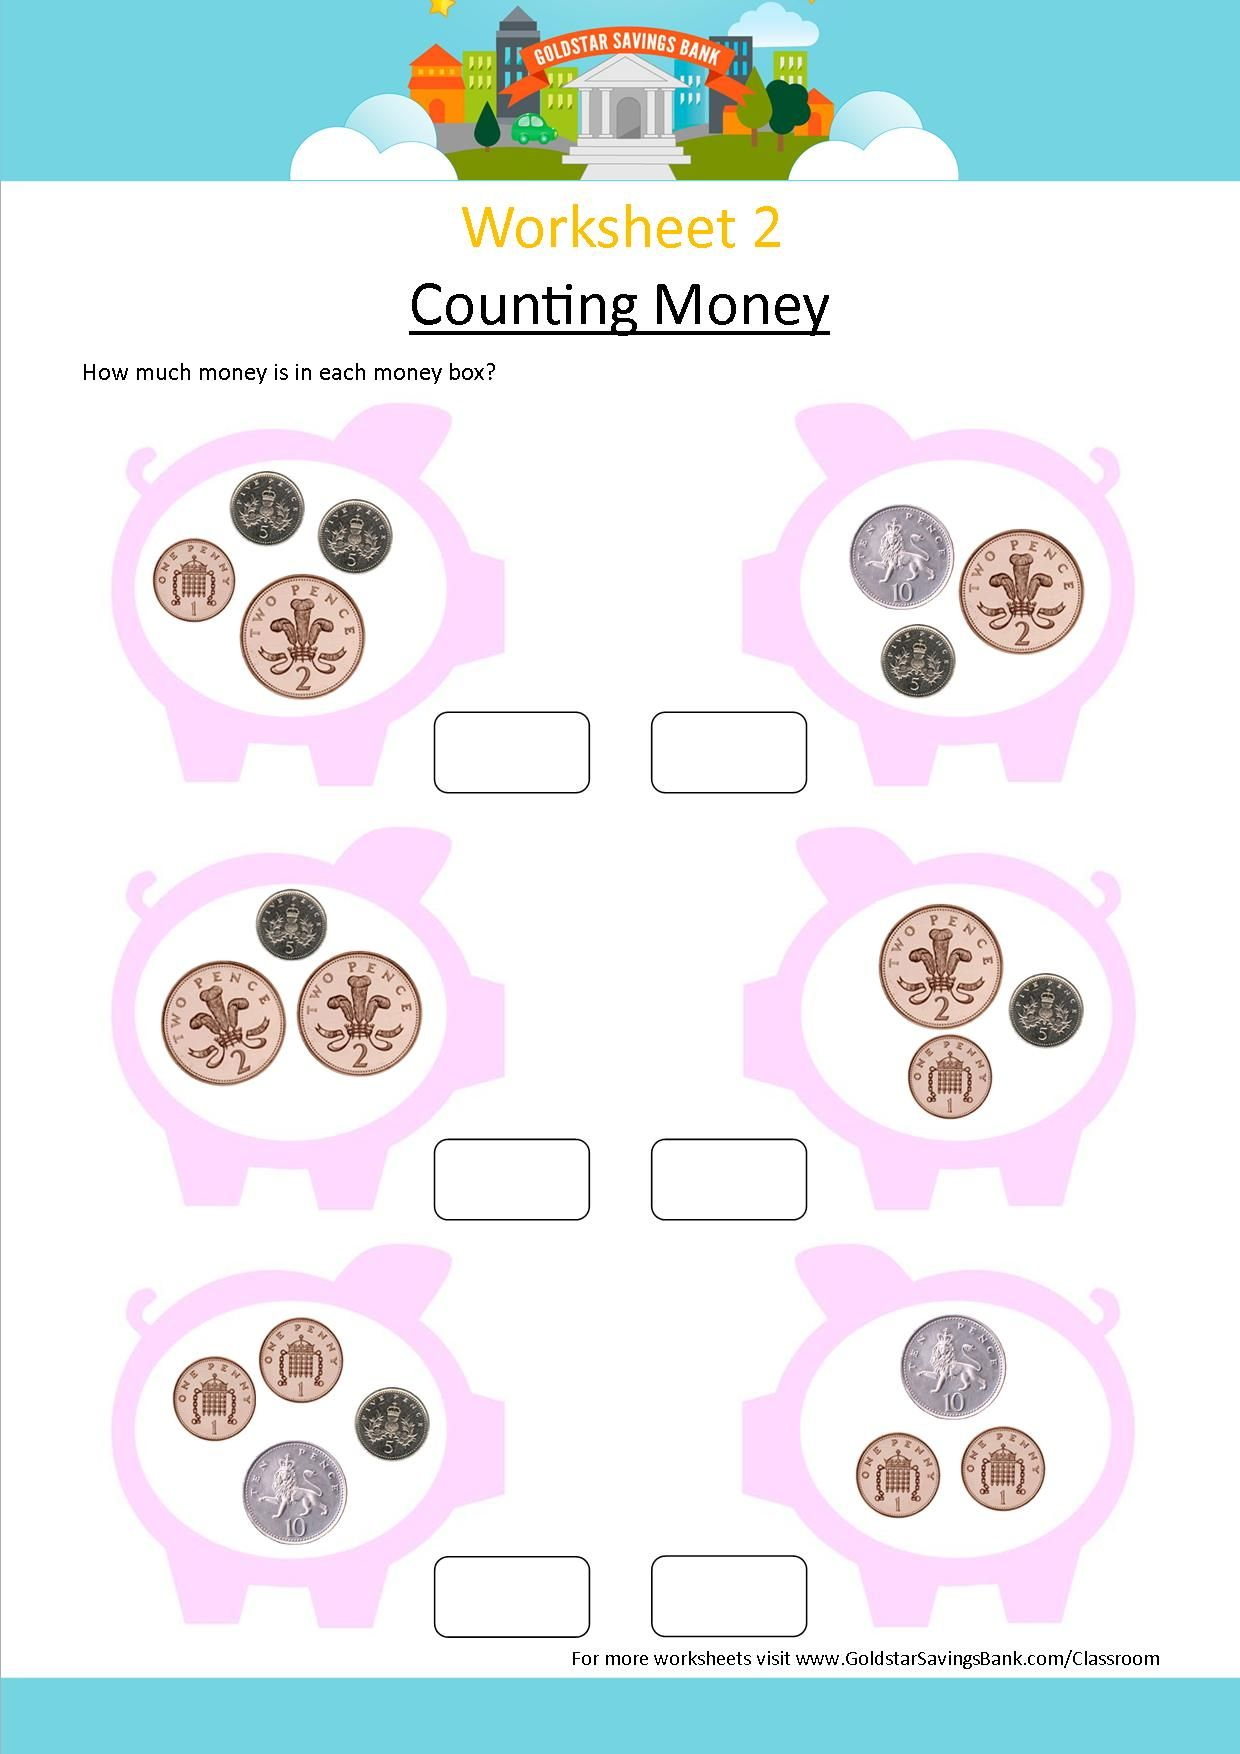 Goldstar Savings Bank Worksheet 2